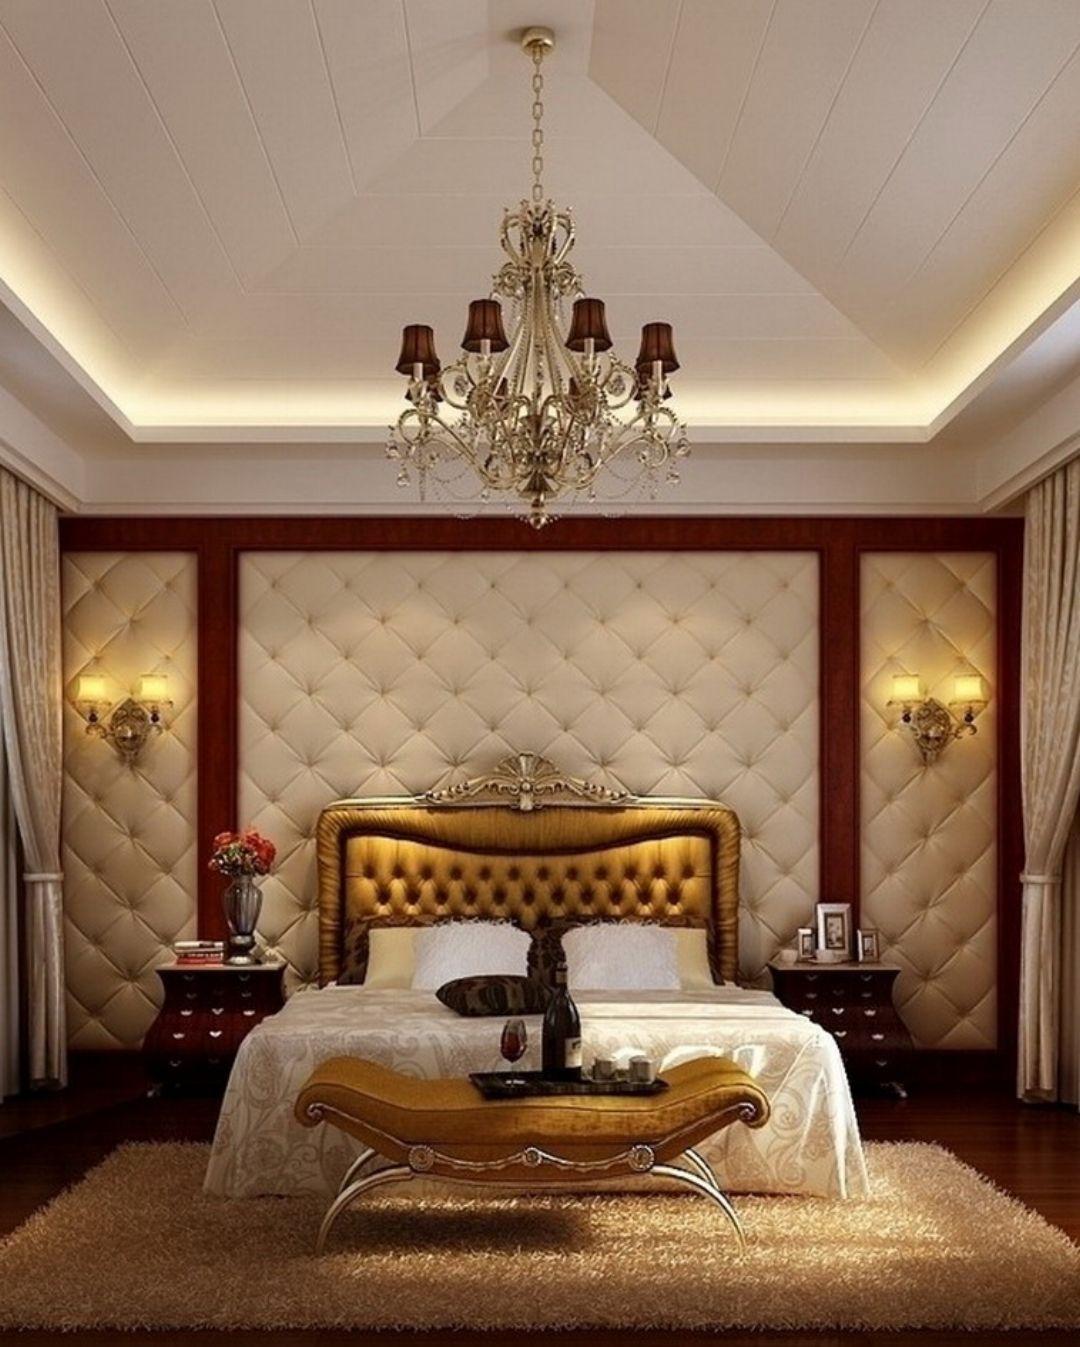 Traditional romantic master bedroom decor   Gorgeous Master Bedroom Designs  Bedrooms Luxury bedding sets